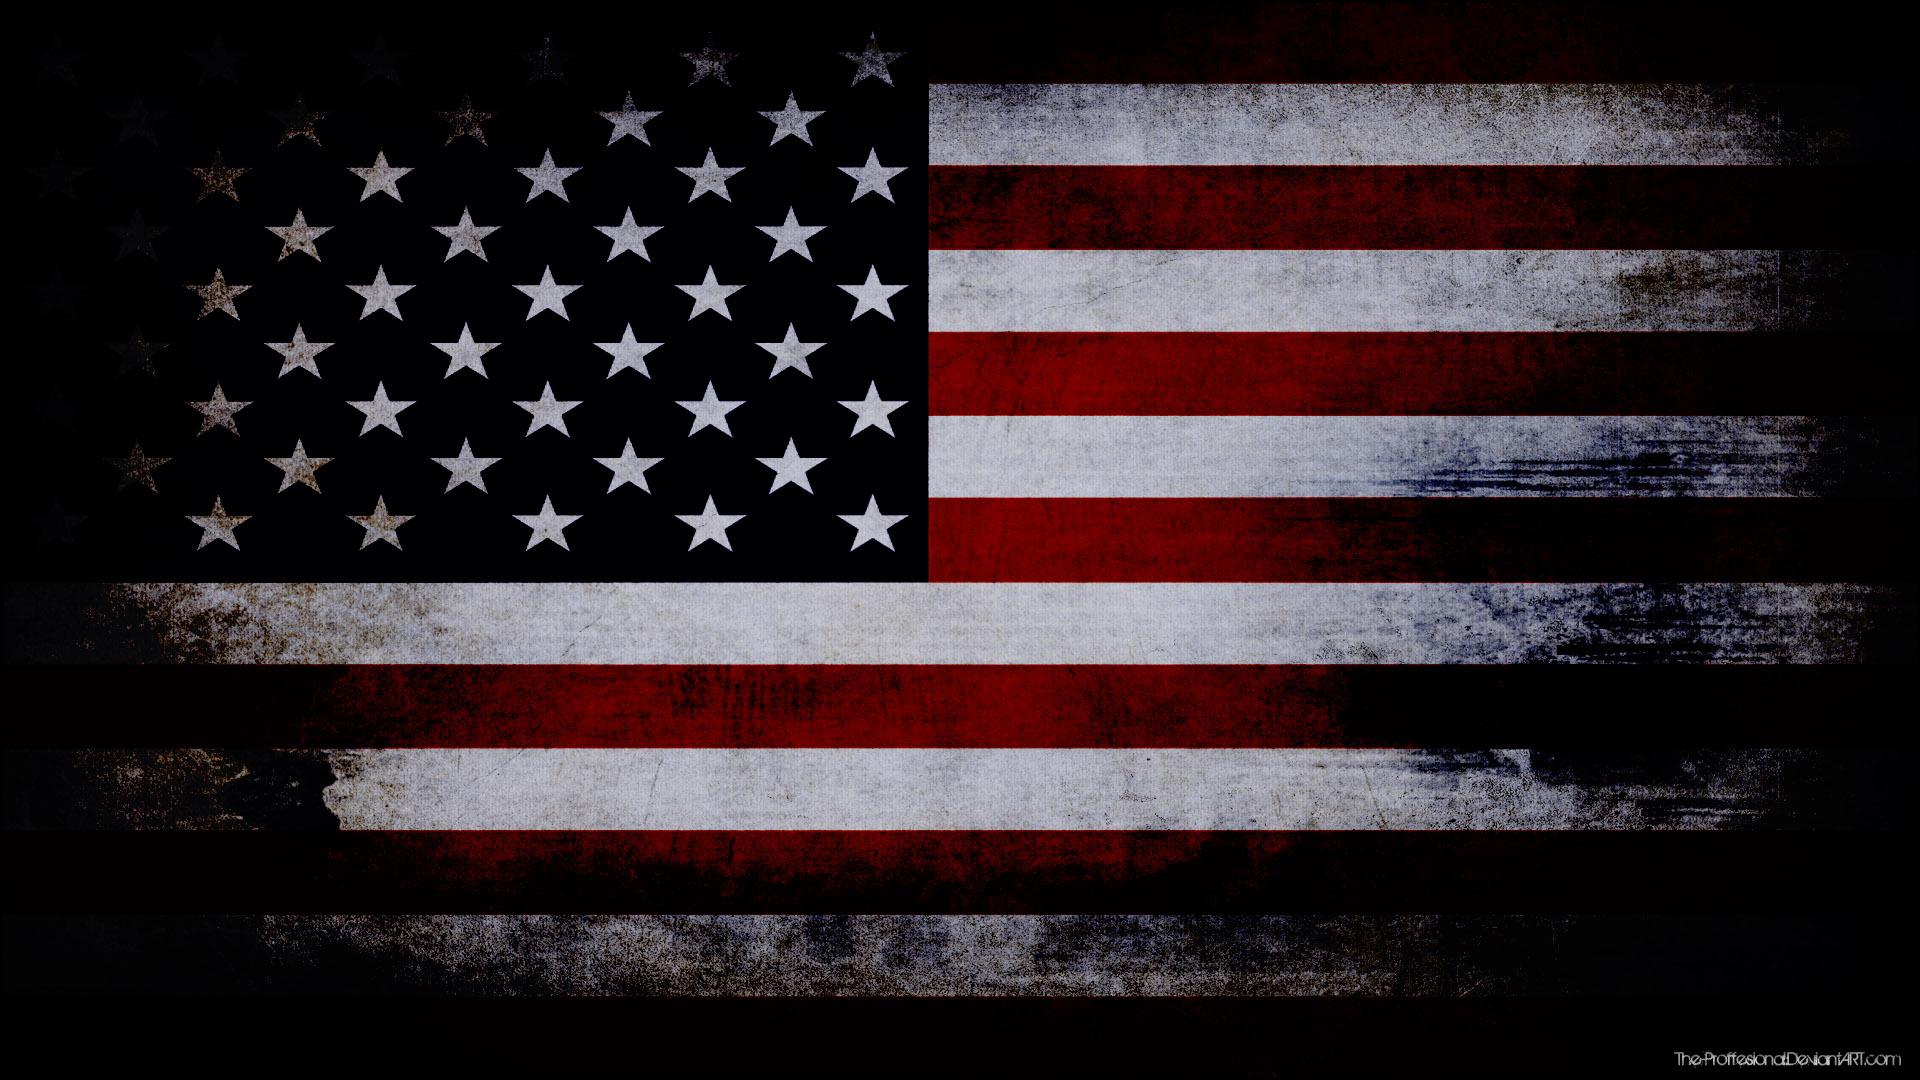 USA wallpaper 1920x1080 45563 1920x1080